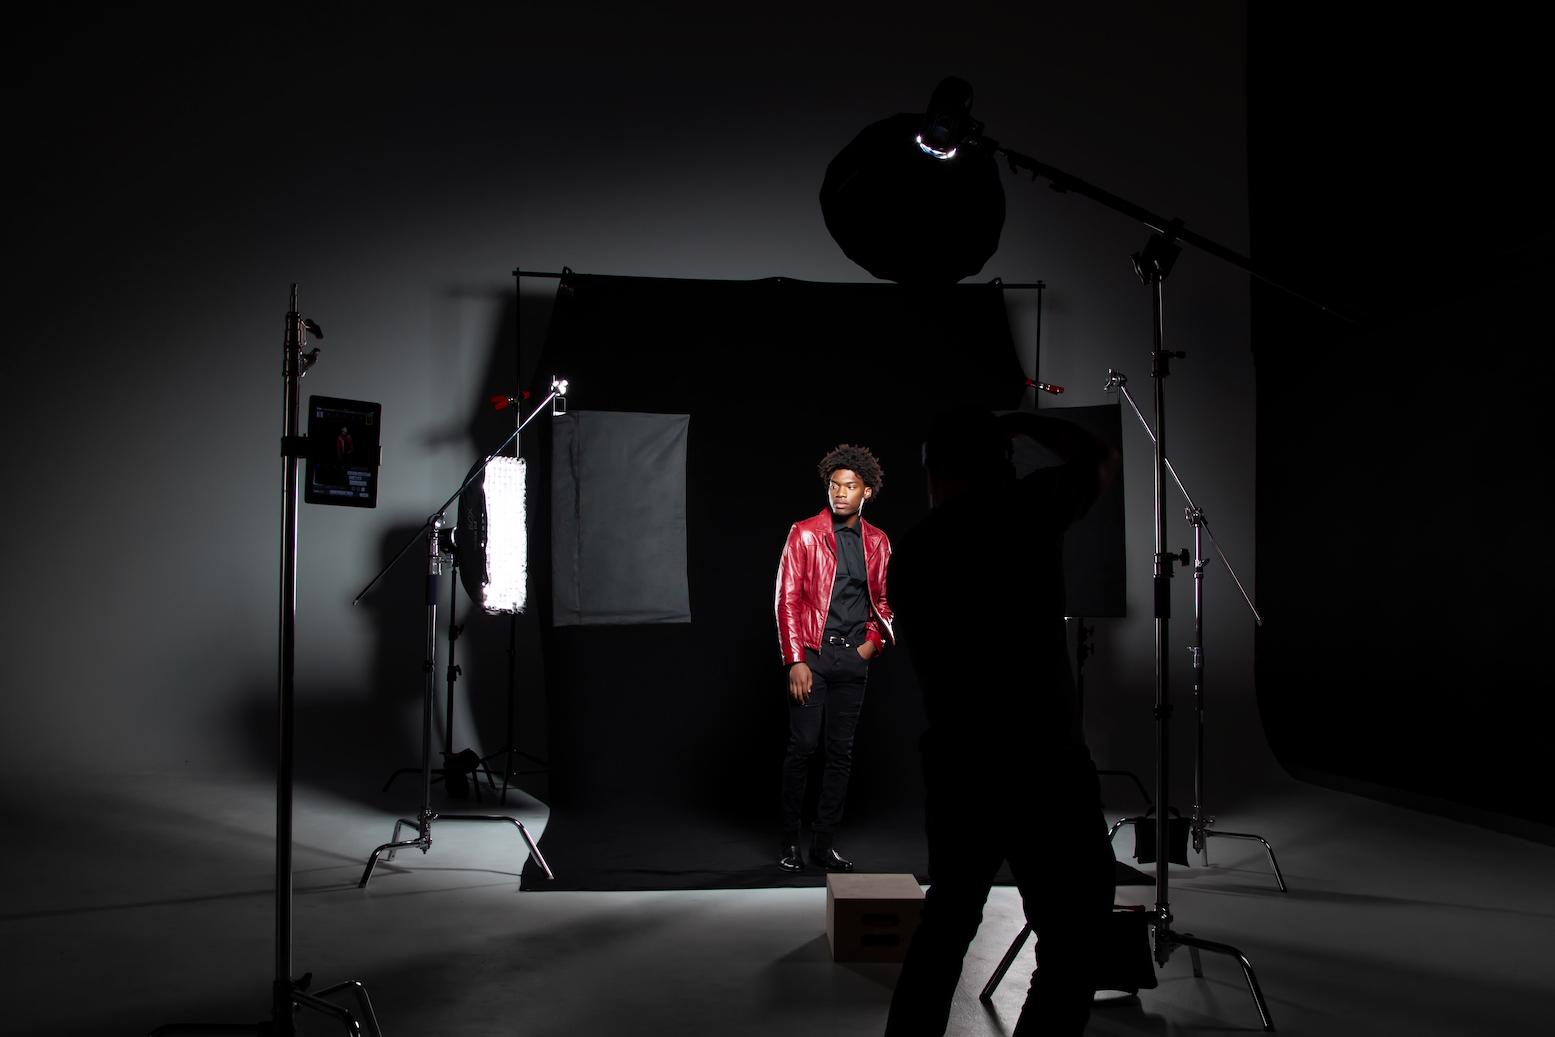 Memperhatikan Pencahayaan - 8 Tips Fotografi untuk Pemula Layaknya Profesional